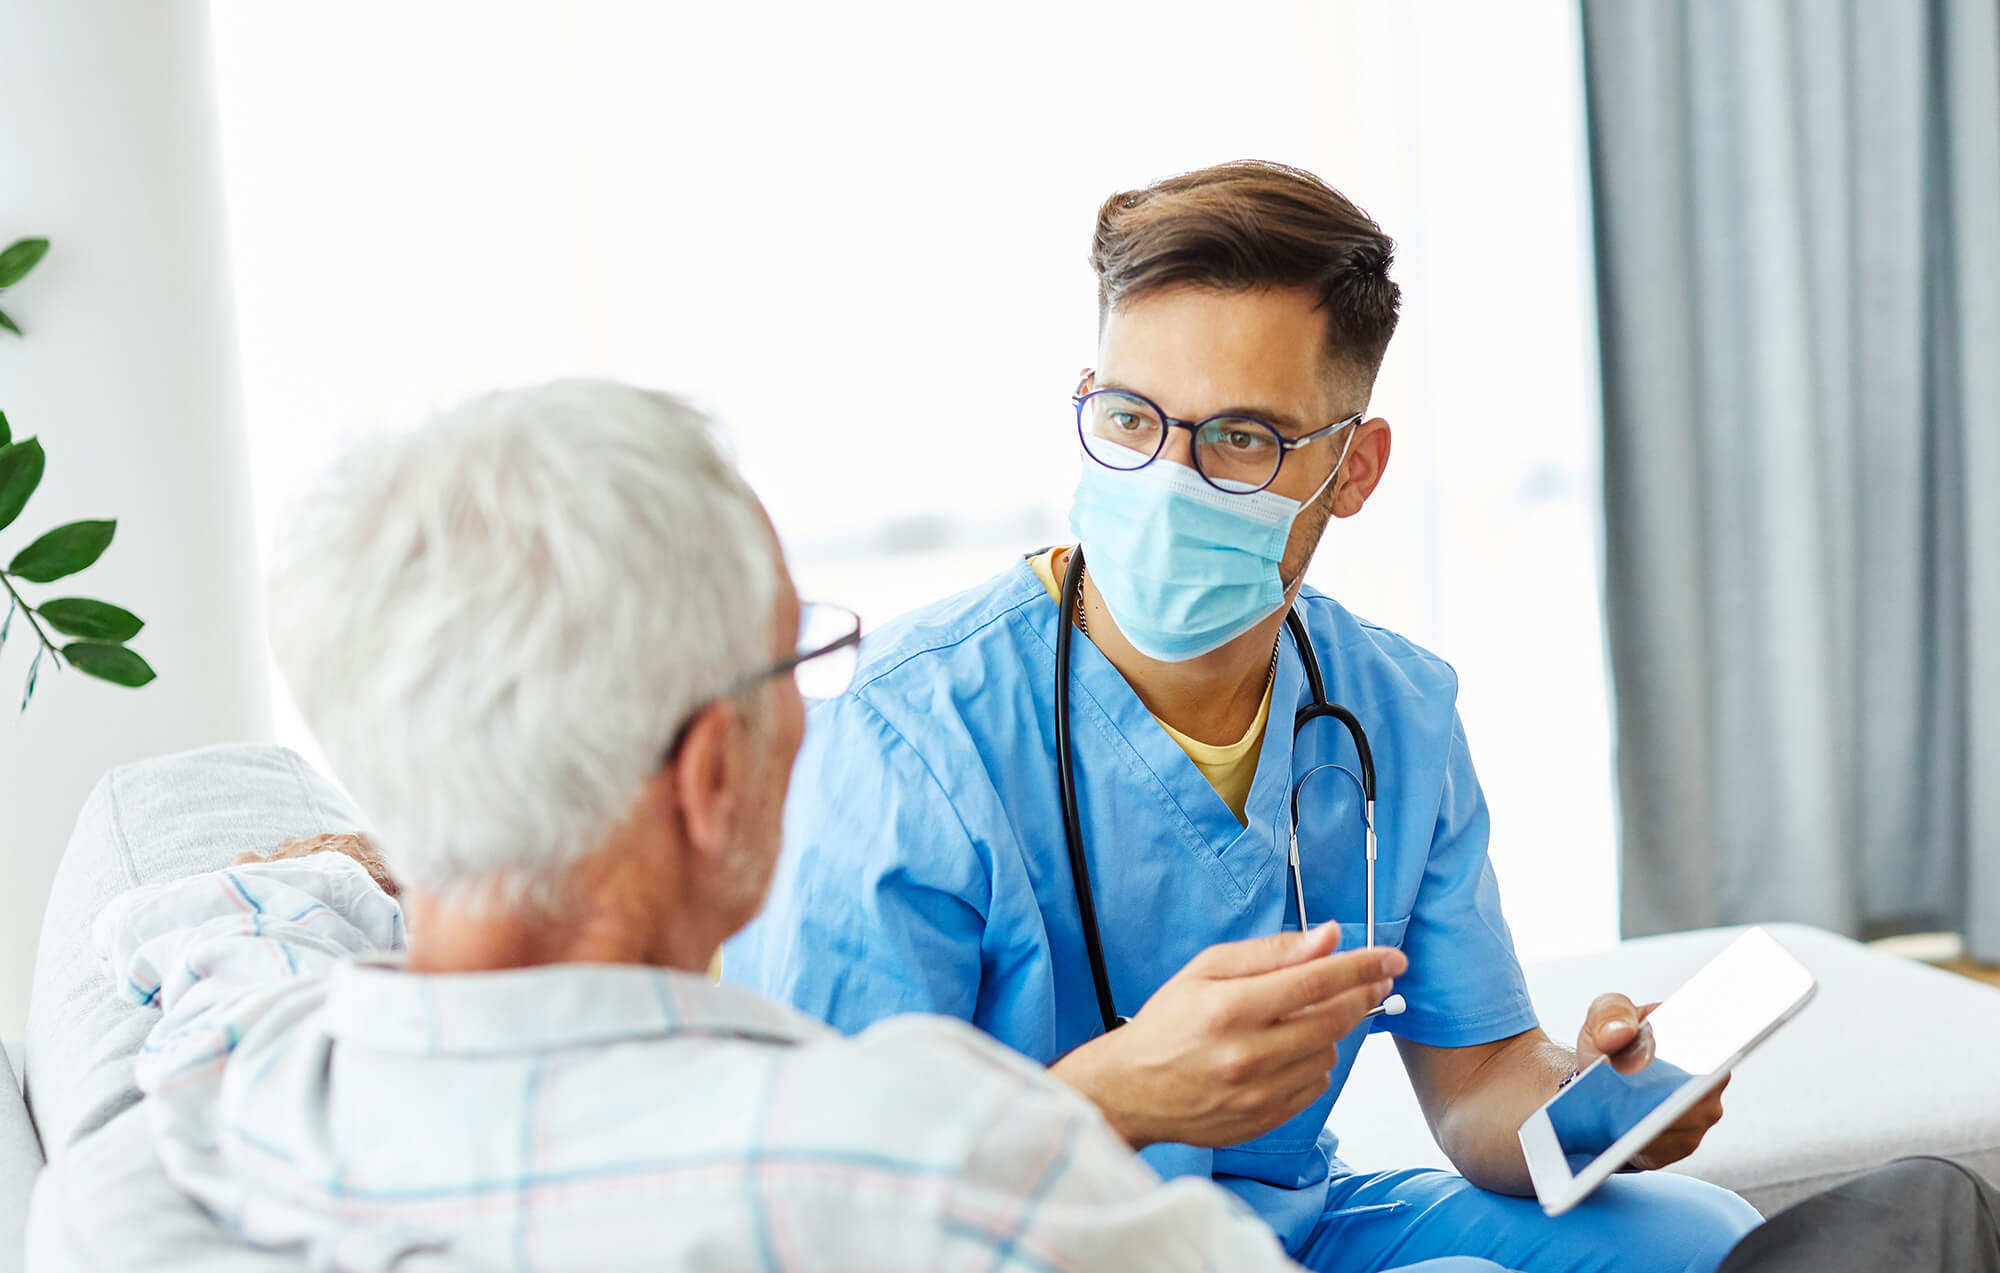 inspire healthcare speech pathology sydney